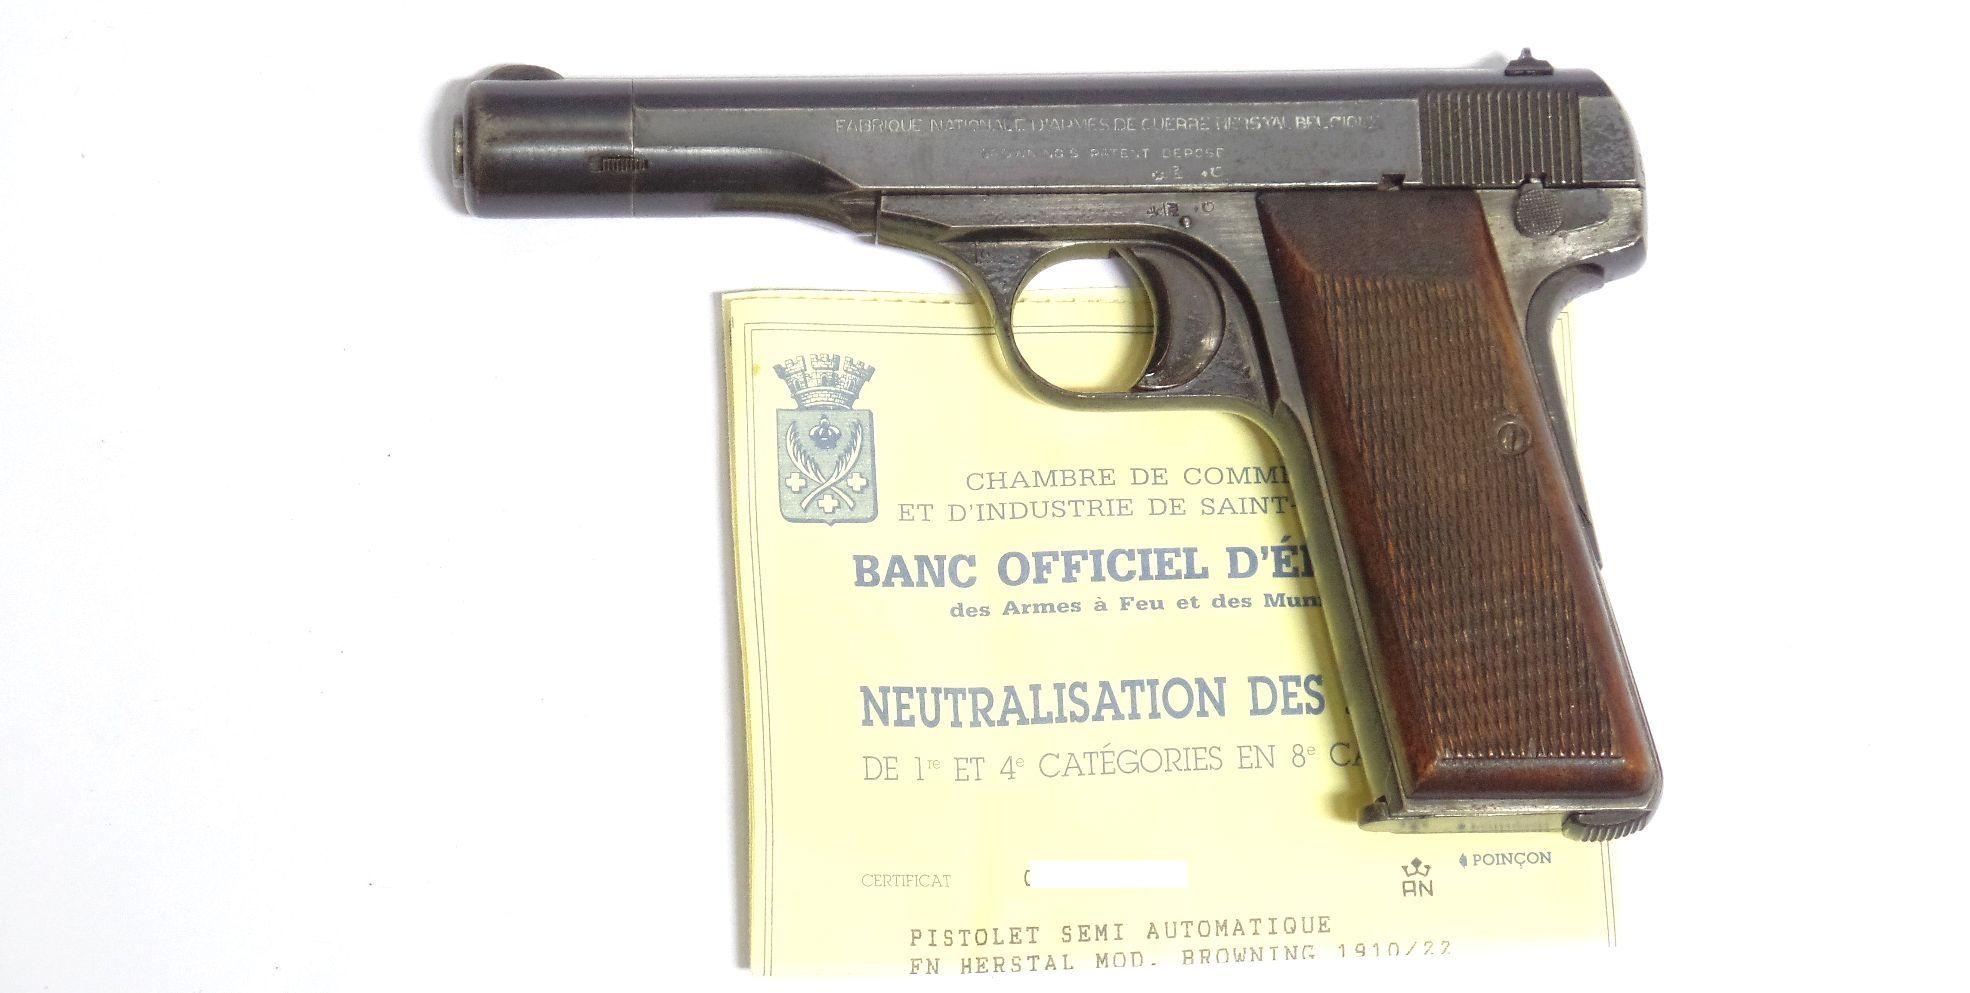 FN 10-22 Neutralisé